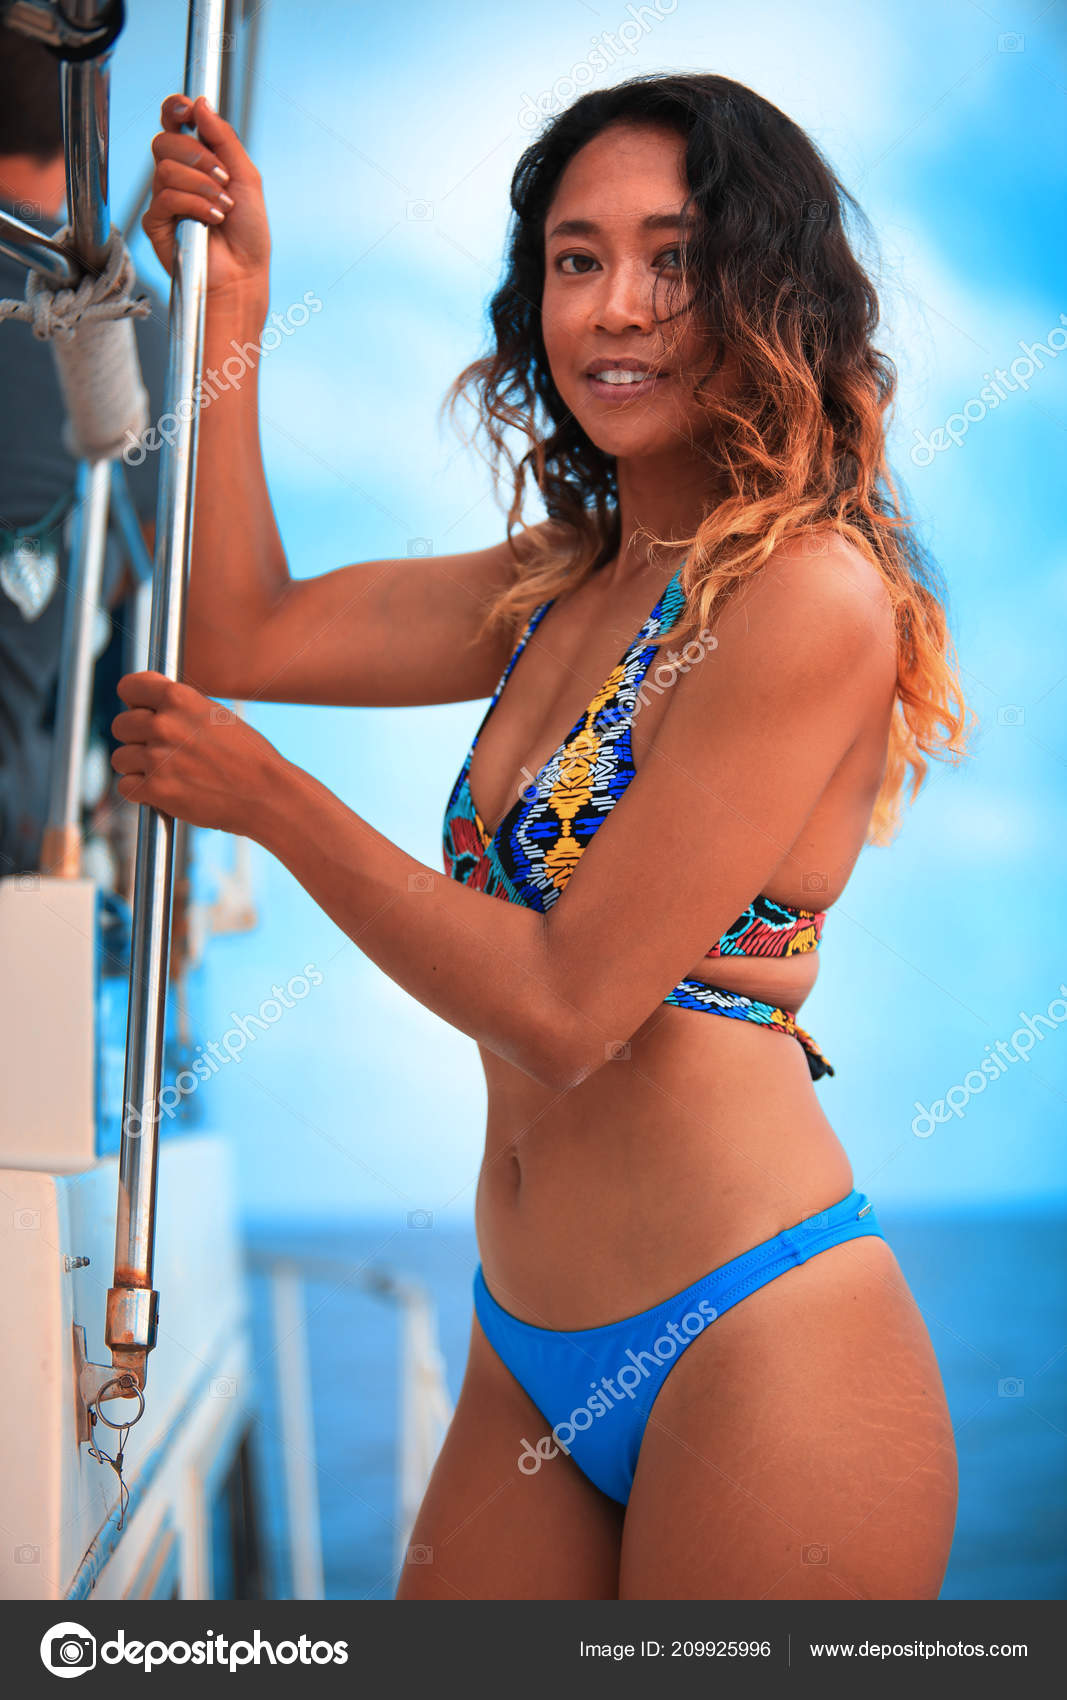 girls Sexy side bikini